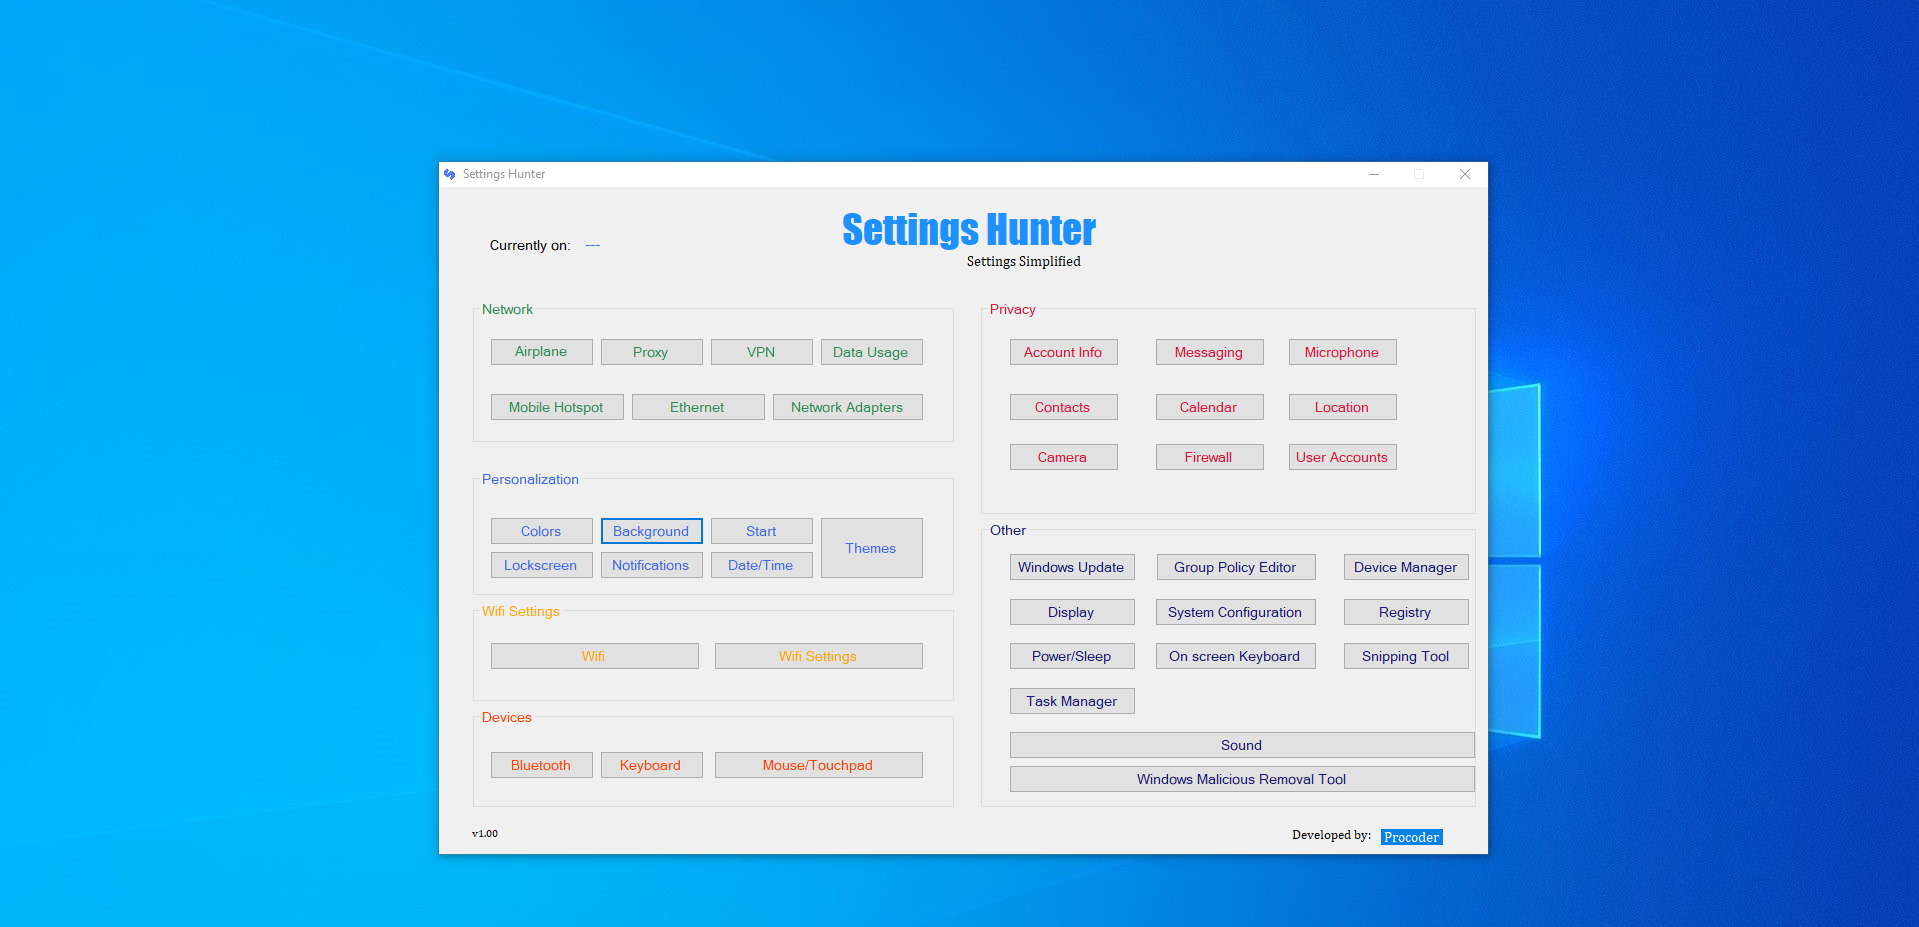 Settings Hunter - Windows 10 Settings Simplified